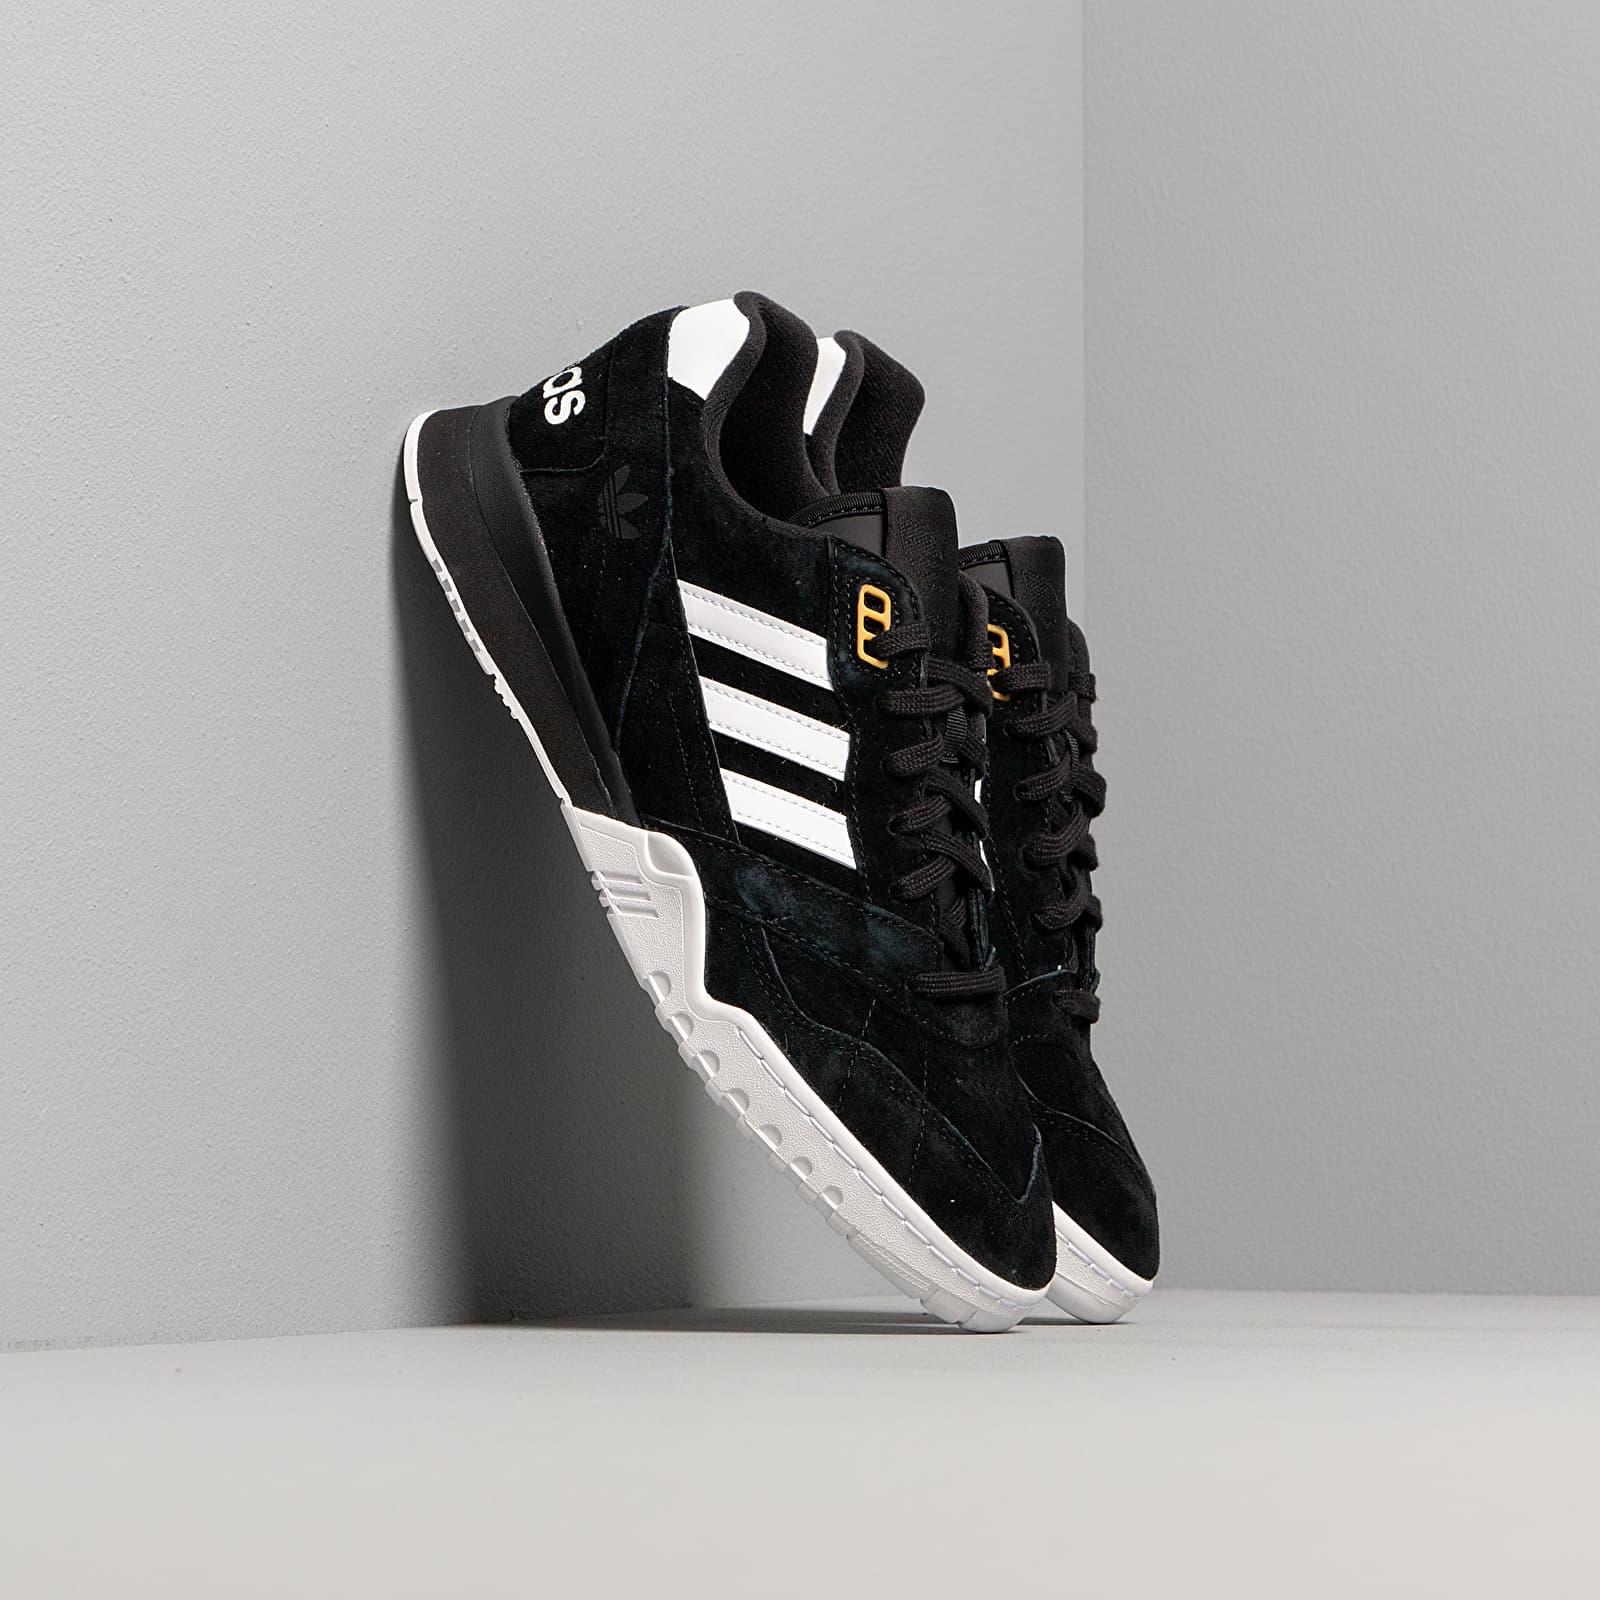 Pánské tenisky a boty adidas A.R. Trainer Core Black/ Ftw White/ Active Gold